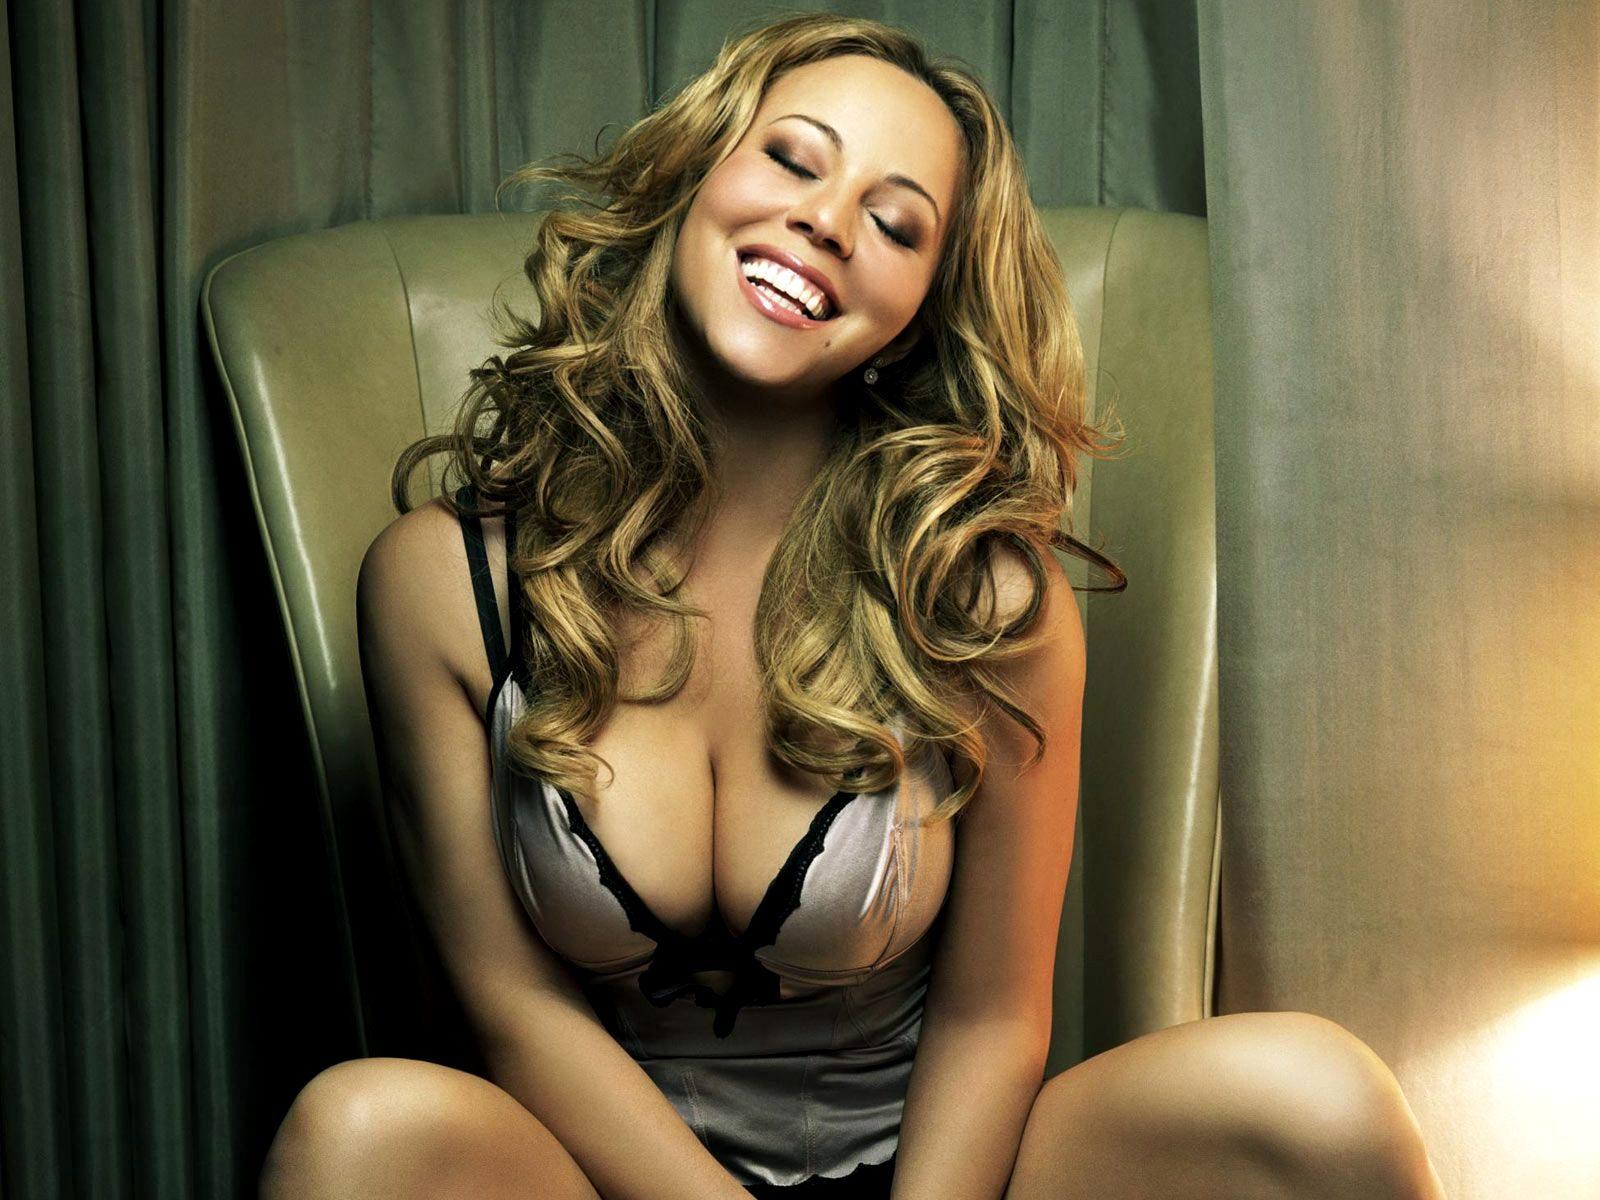 http://3.bp.blogspot.com/-yXzke1xqLCs/UOU_Tk_neSI/AAAAAAAAZjw/x4PsbCzPKfo/s1600/3049-celebrity_mariah_carey_wallpaper.jpg